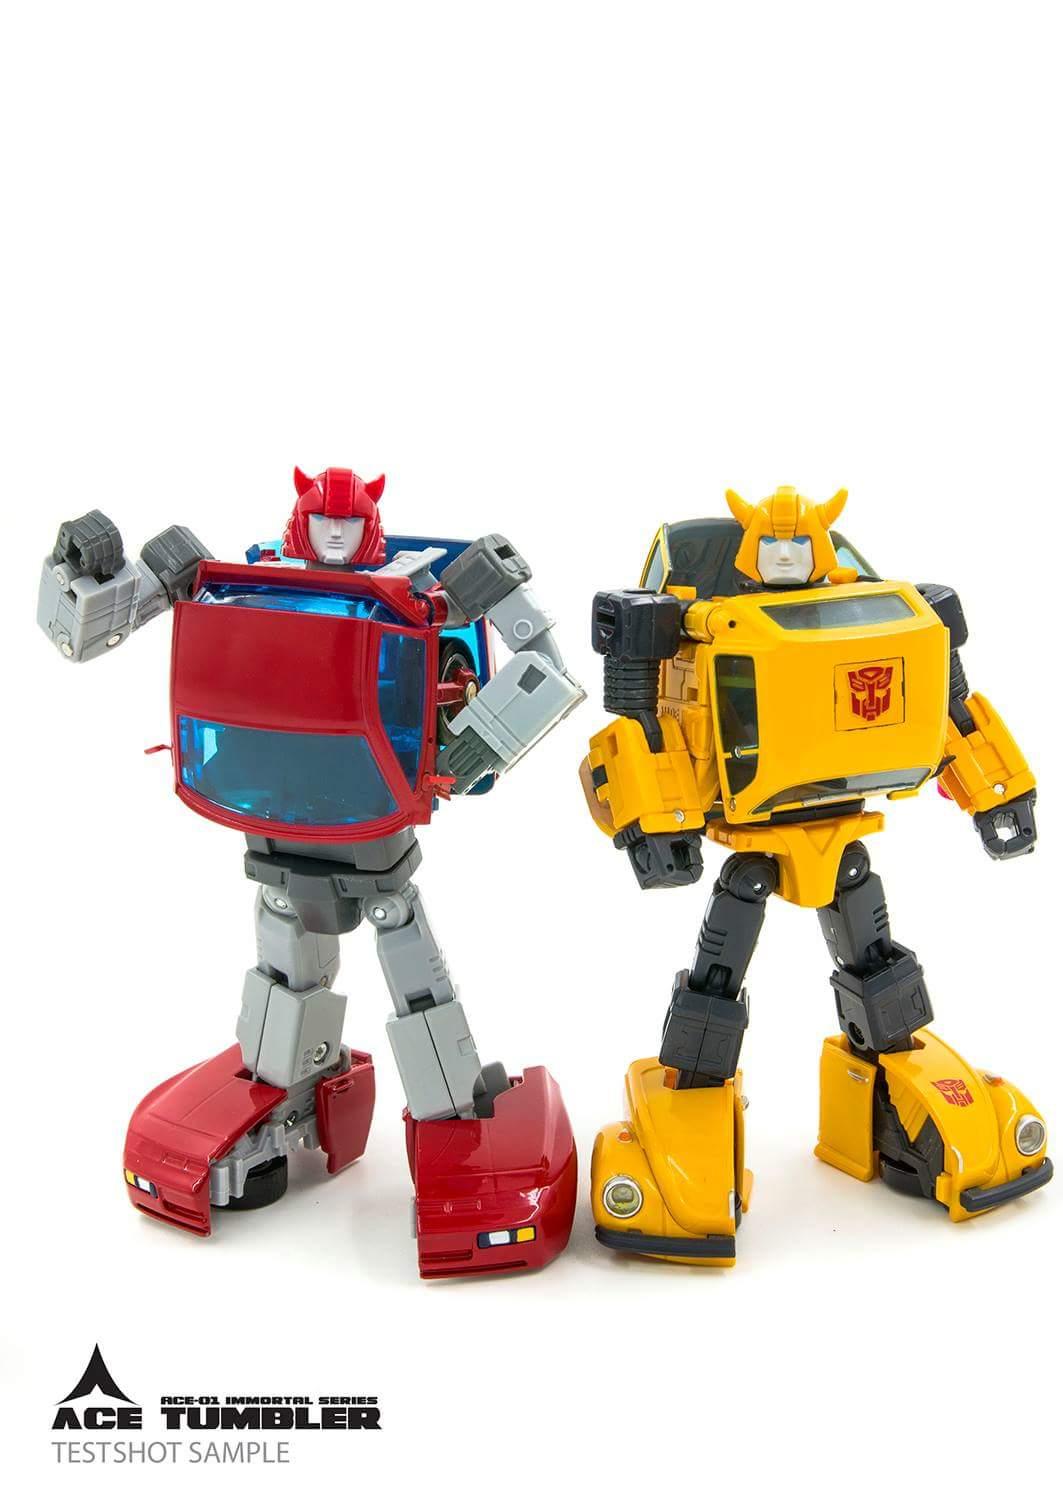 [ACE Collectables] Produit Tiers - Minibots MP - ACE-01 Tumbler (aka Cliffjumper/Matamore), ACE-02 Hiccups (aka Hubcap/Virevolto), ACE-03 Trident (aka Seaspray/Embruns) EUJdxZT4